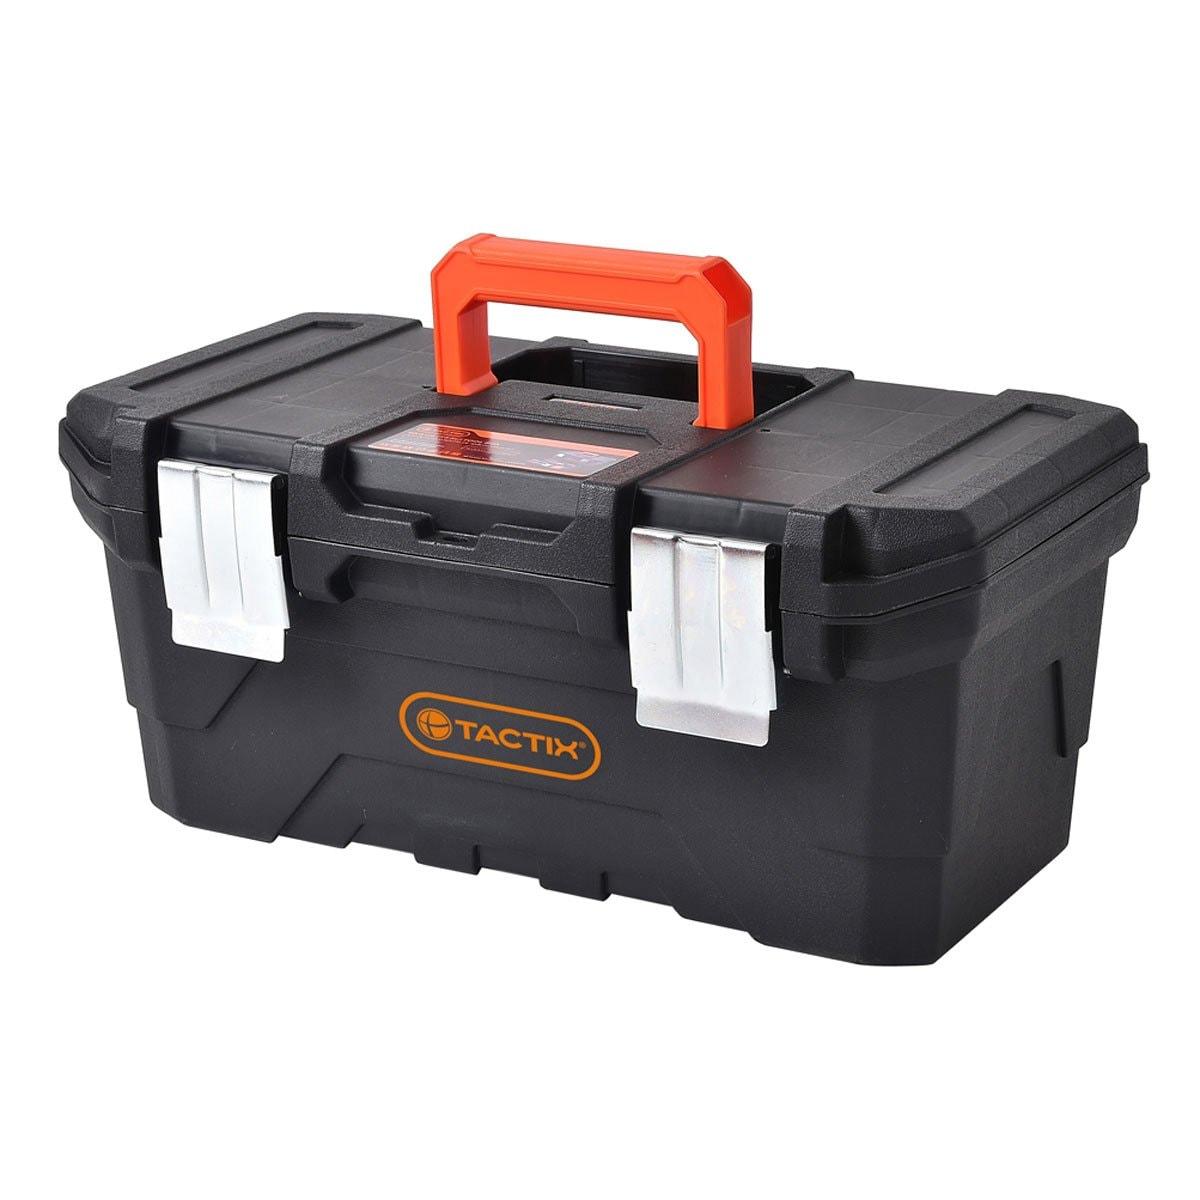 Caja Herramienta de Plástico 40.8 Cm (16 In) Tactix